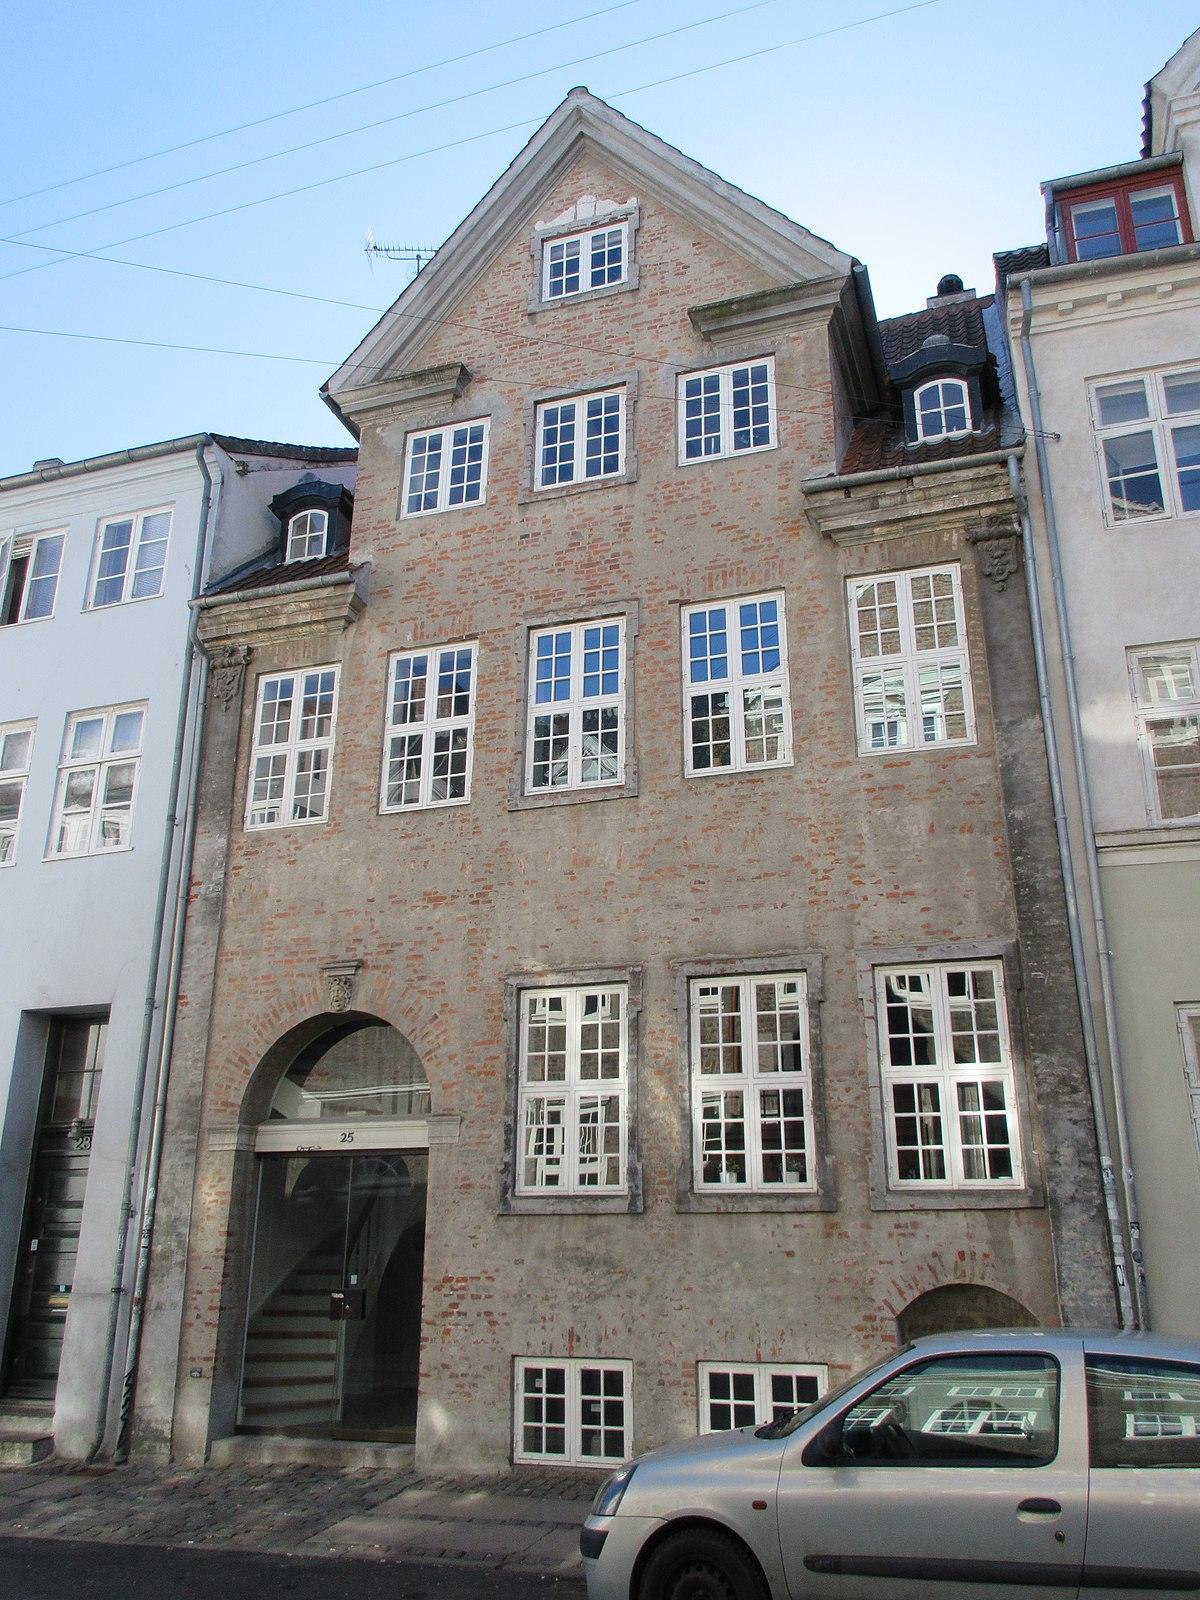 Åbenrå 25 (Copenhagen).jpg